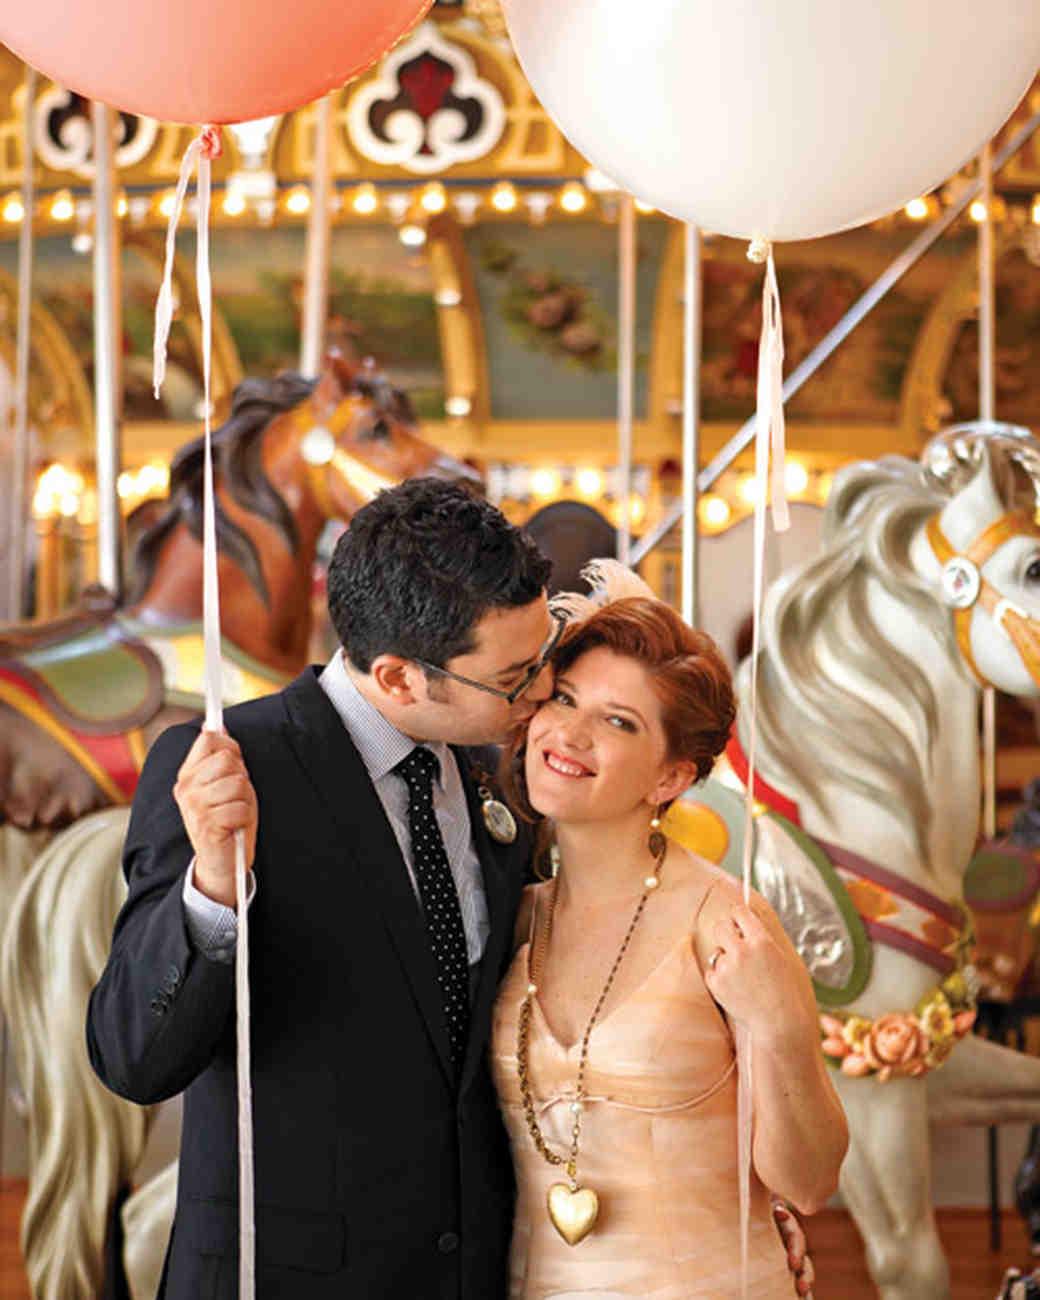 A Vibrant Whimsical Vintage Wedding In Brooklyn New York